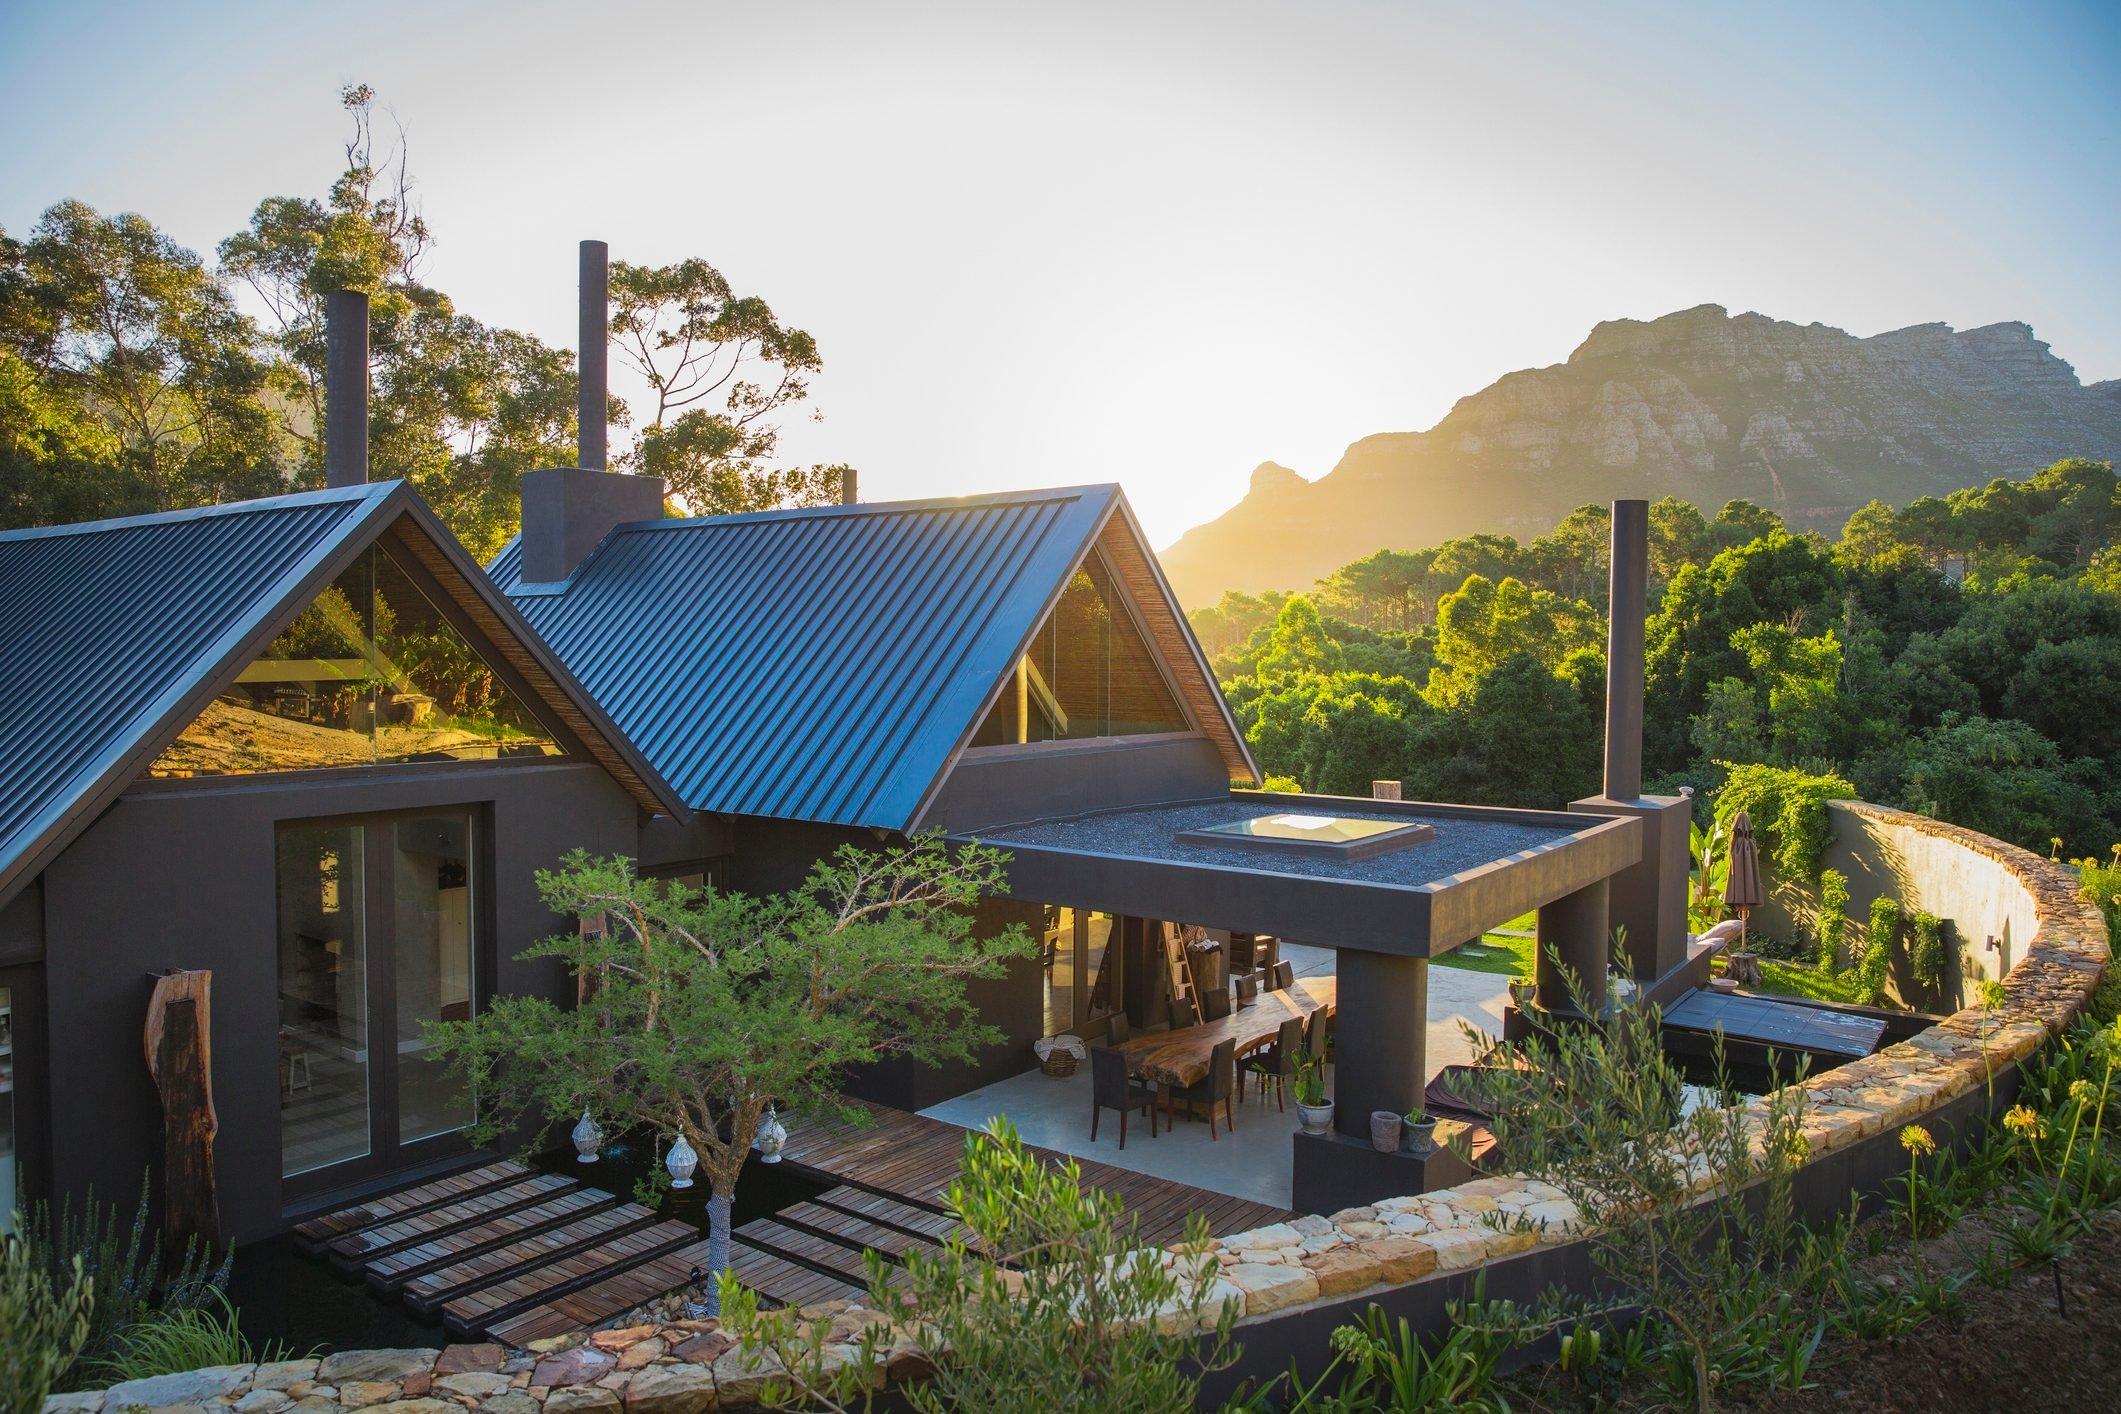 Luxurious tourist resort